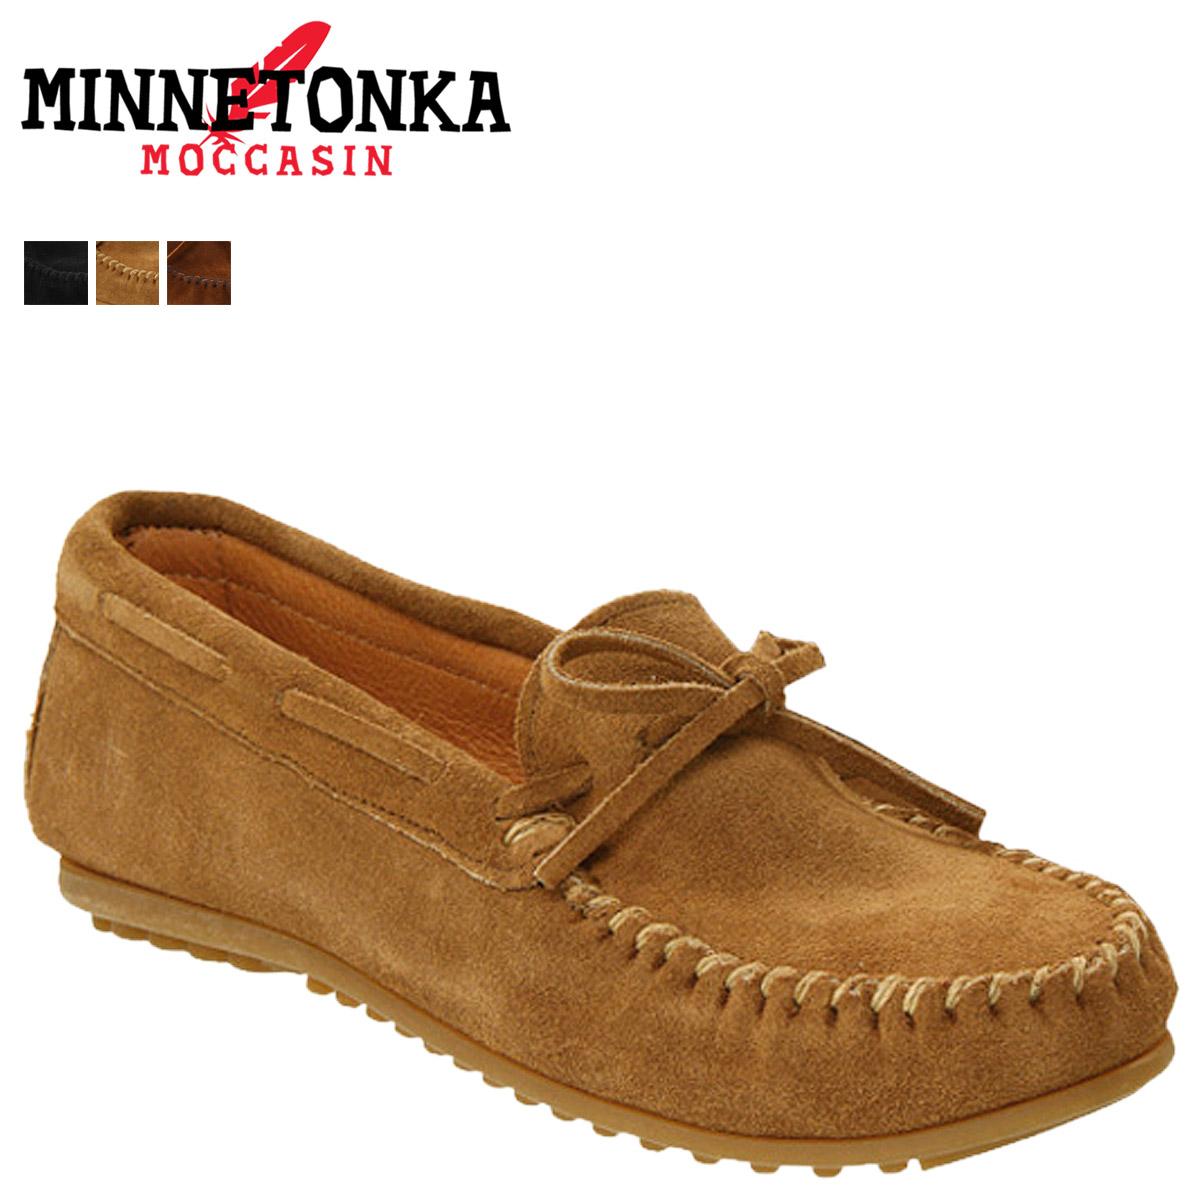 3ae8129370bc1 SneaK Online Shop: Mine Tonka MINNETONKA men moccasins classical ...